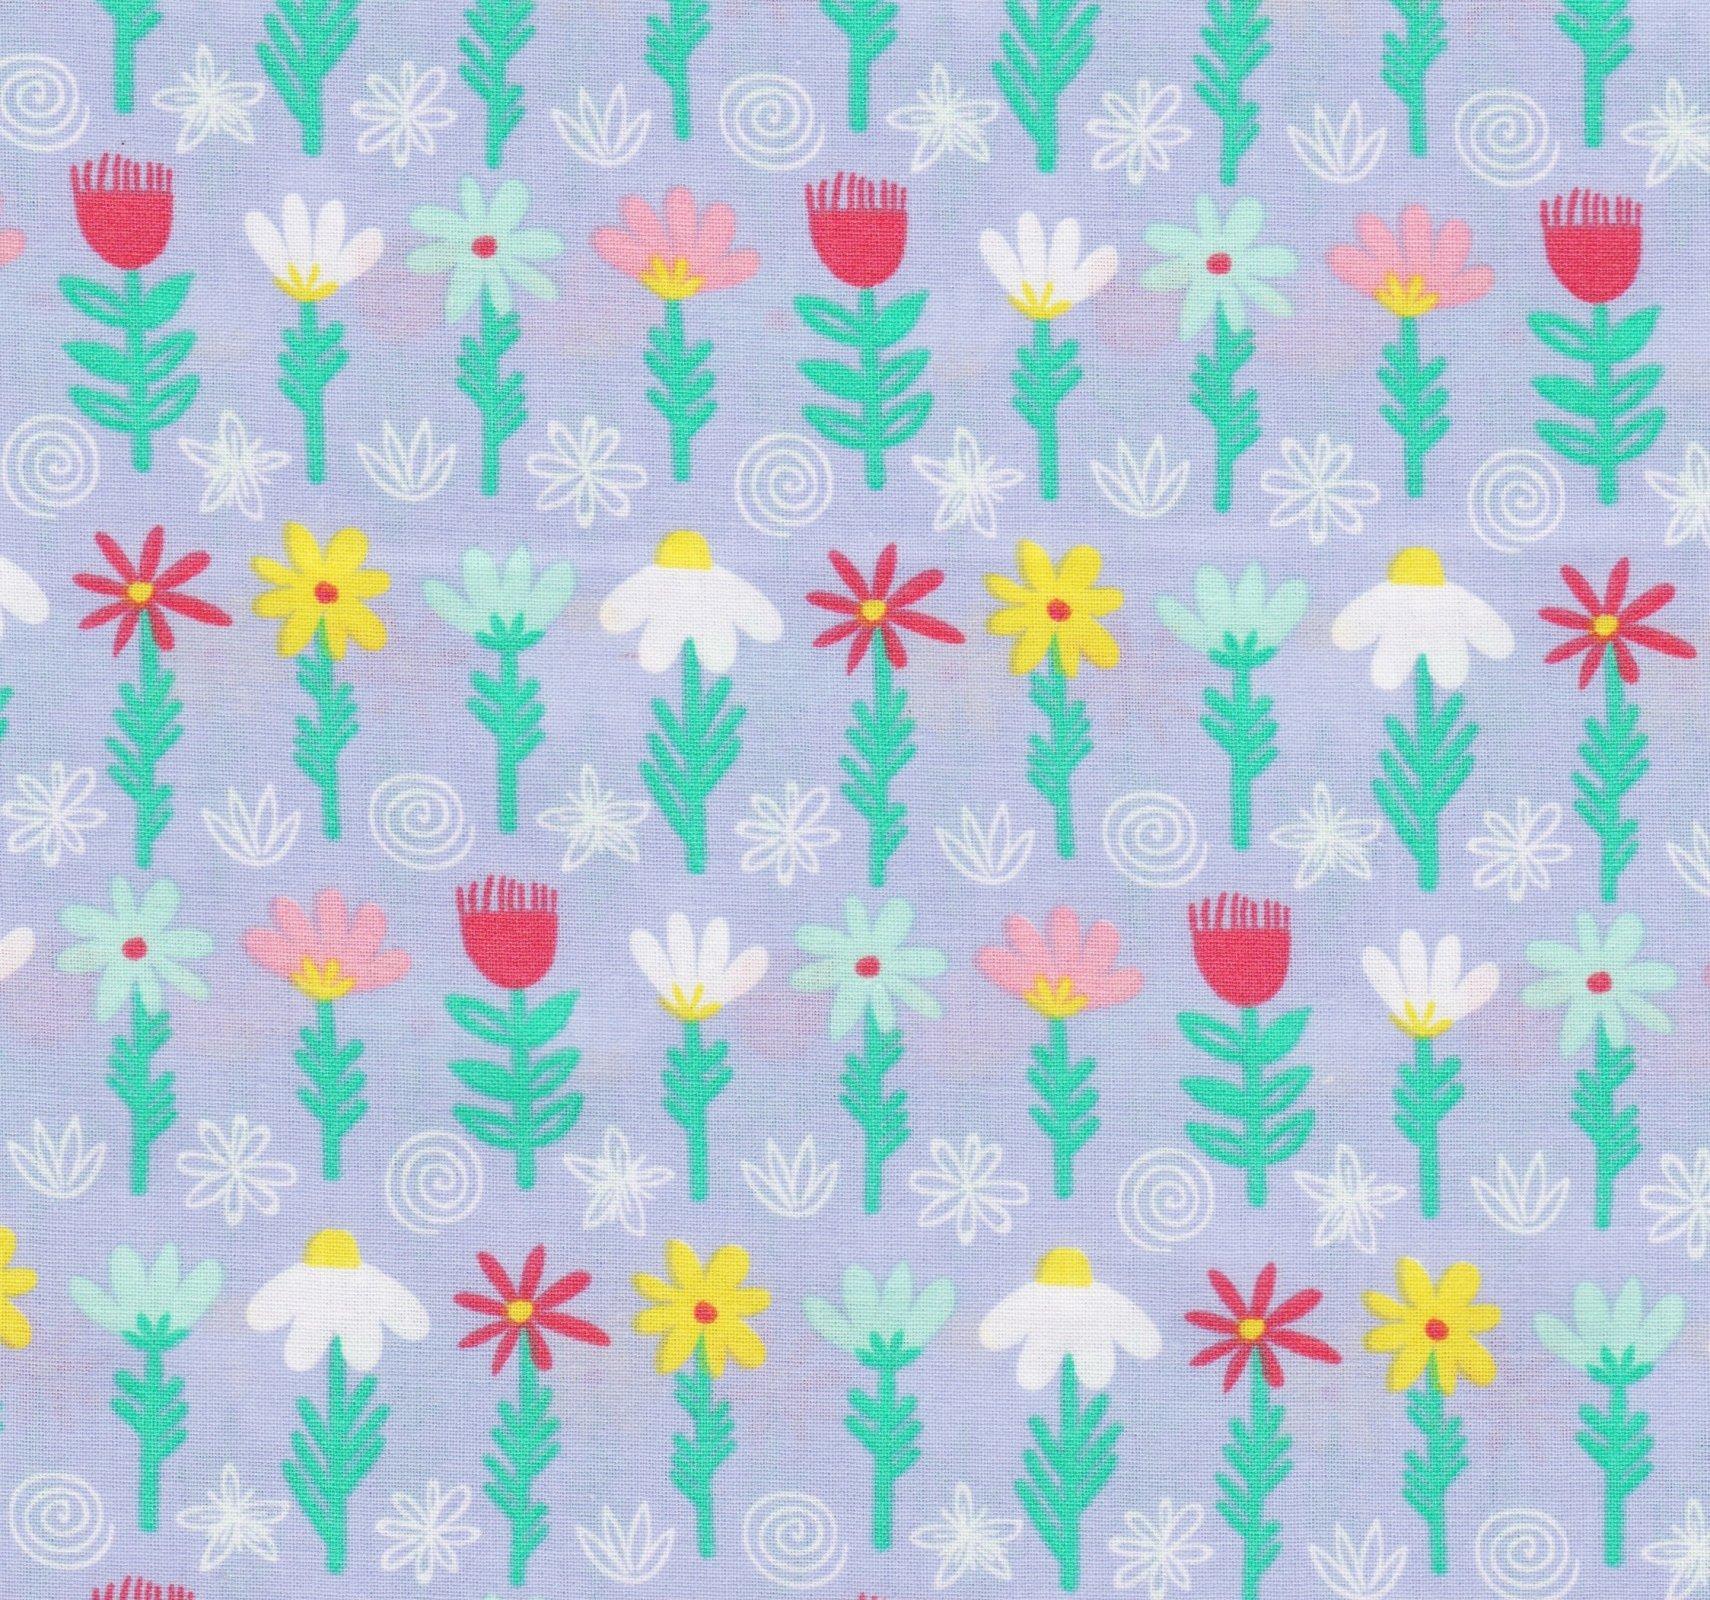 PROMO* FT-Children's Prints 49704 Multi - Flowers